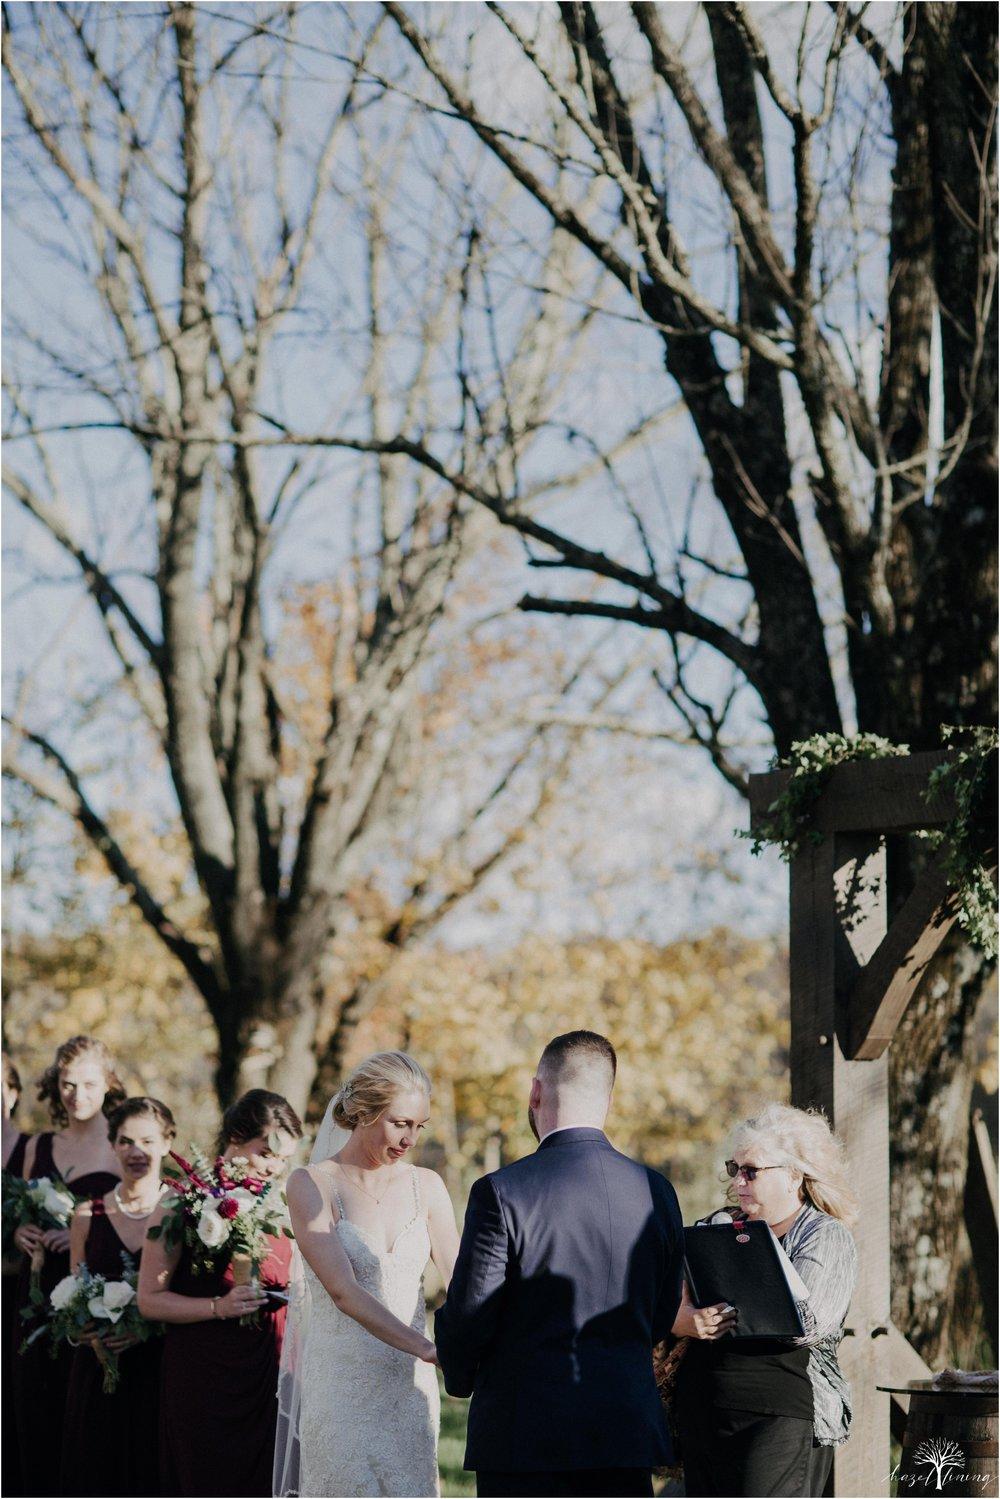 briana-krans-greg-johnston-farm-bakery-and-events-fall-wedding_0096.jpg